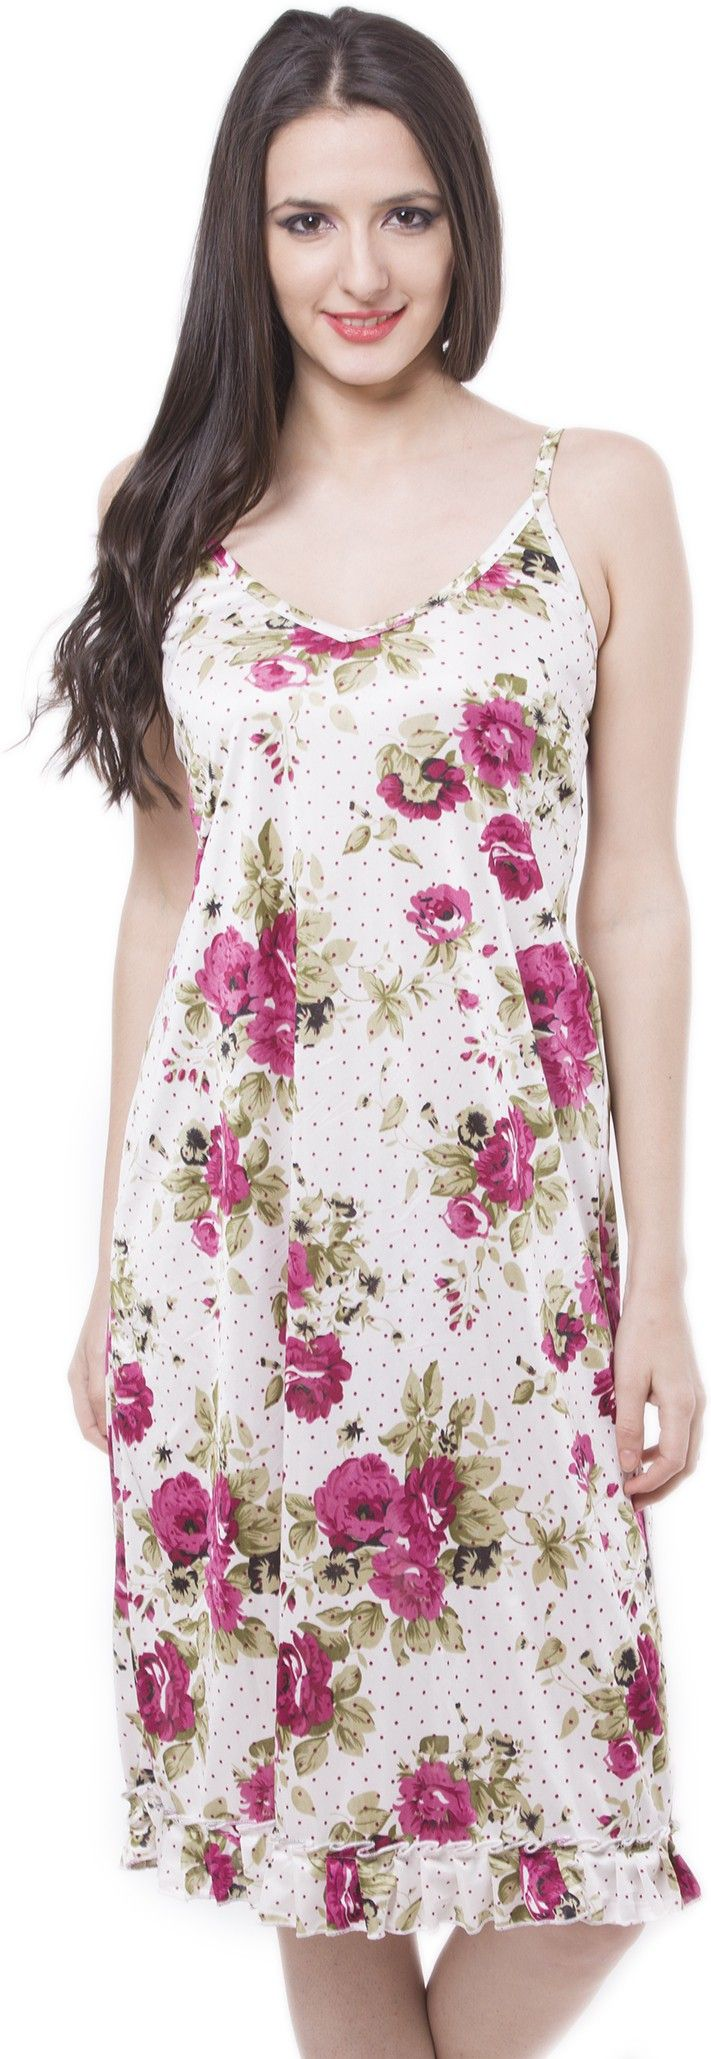 #BuyFromLink --> http://fkrt.it/iqwl~NNNNN #Women's #Floral #Sleeveless #Satin #Nighty #style #NIGHTWEAR #intimate #Gift #Shop #Buy #online #India #Women #Fashion